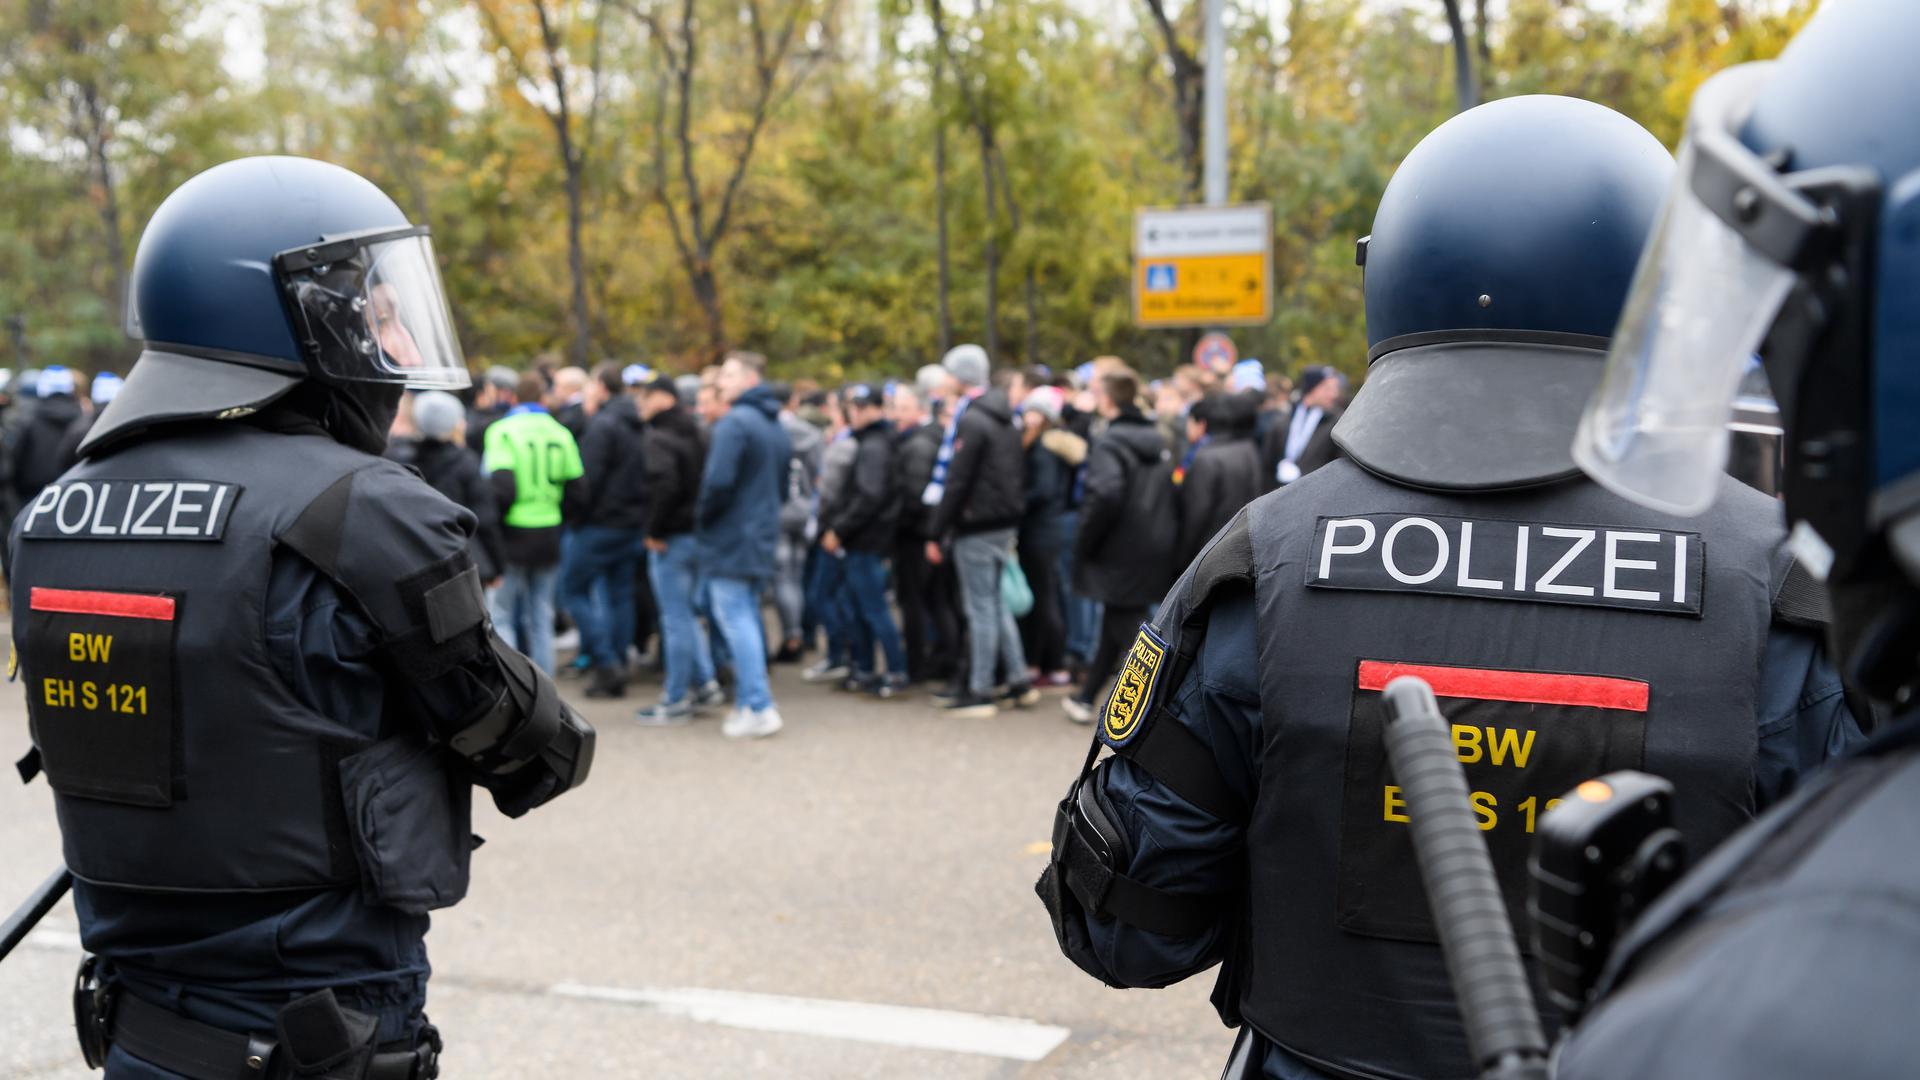 Polizei sichert den Fanmarsch des KSC.  GES/ Fussball/ 2. Bundesliga: VfB Stuttgart - Karlsruher SC, 24.11.2019  Football / Soccer: 2nd League: VfB Stuttgart vs Karlsruher SC, Stuttgart, November 24, 2019